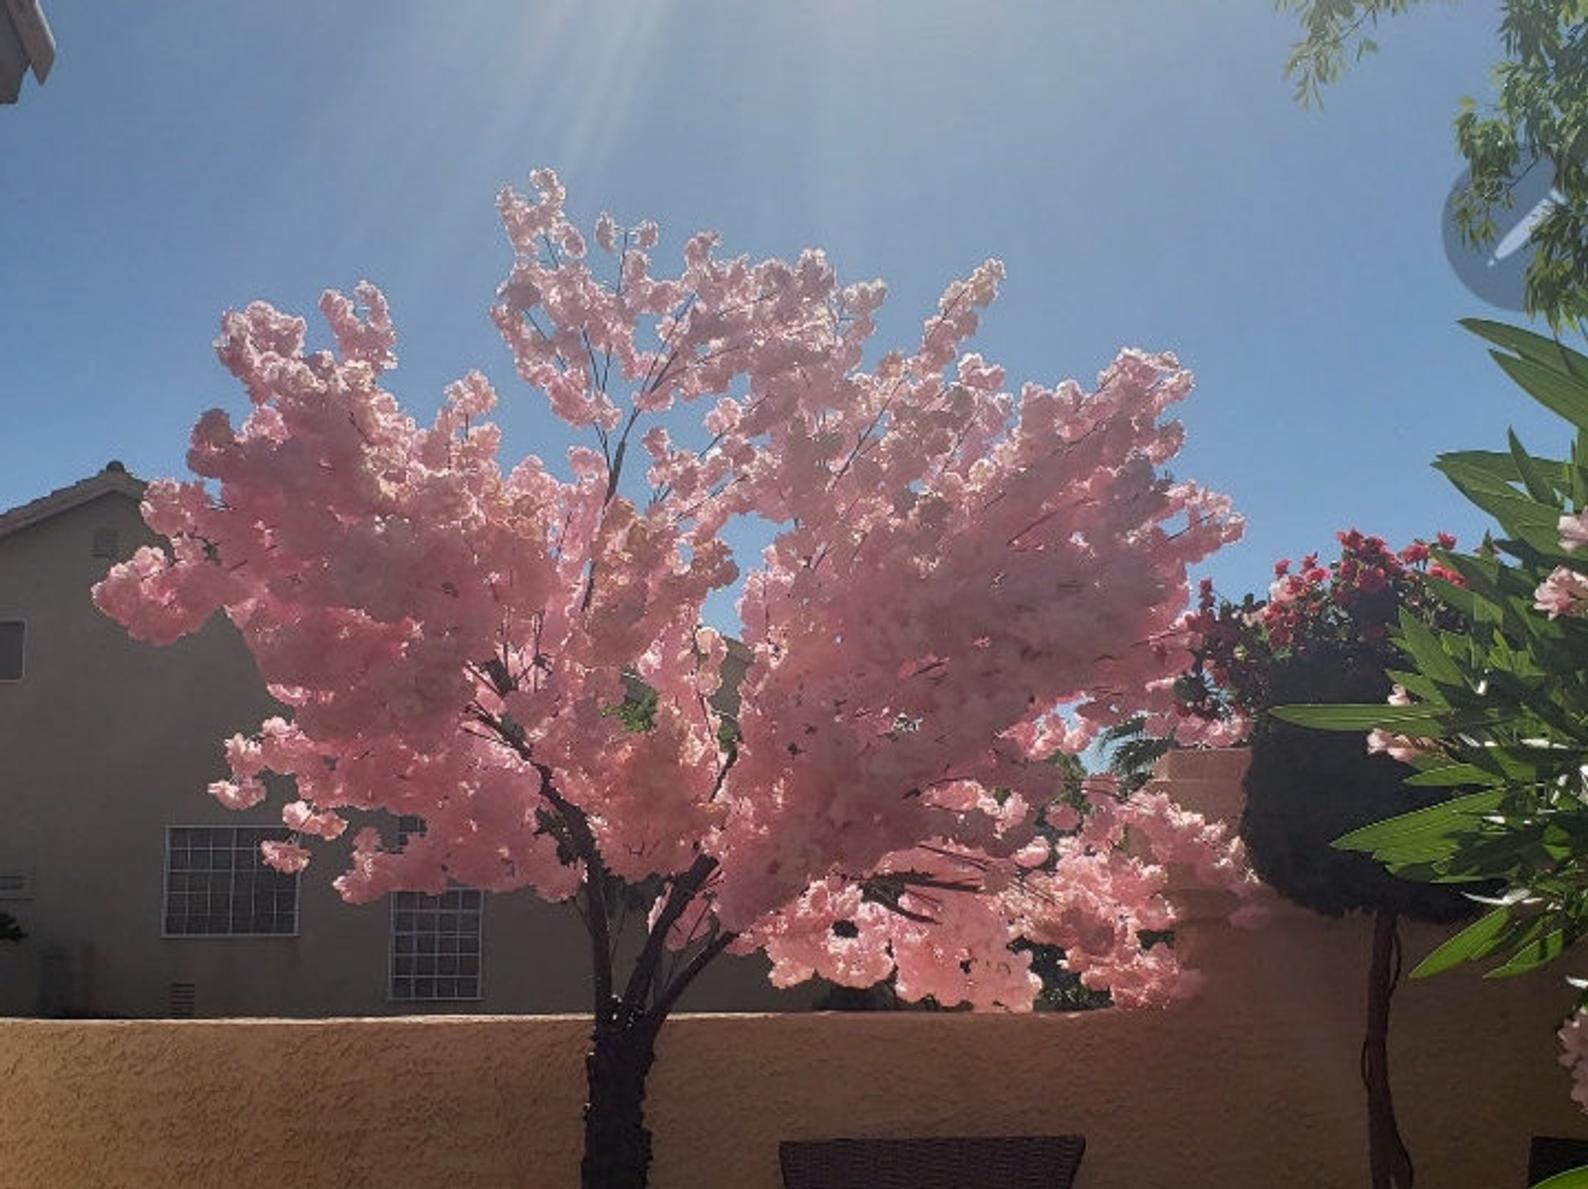 Okame Cherry Tree In 2021 Cherry Tree Flowering Cherry Tree Blossom Trees